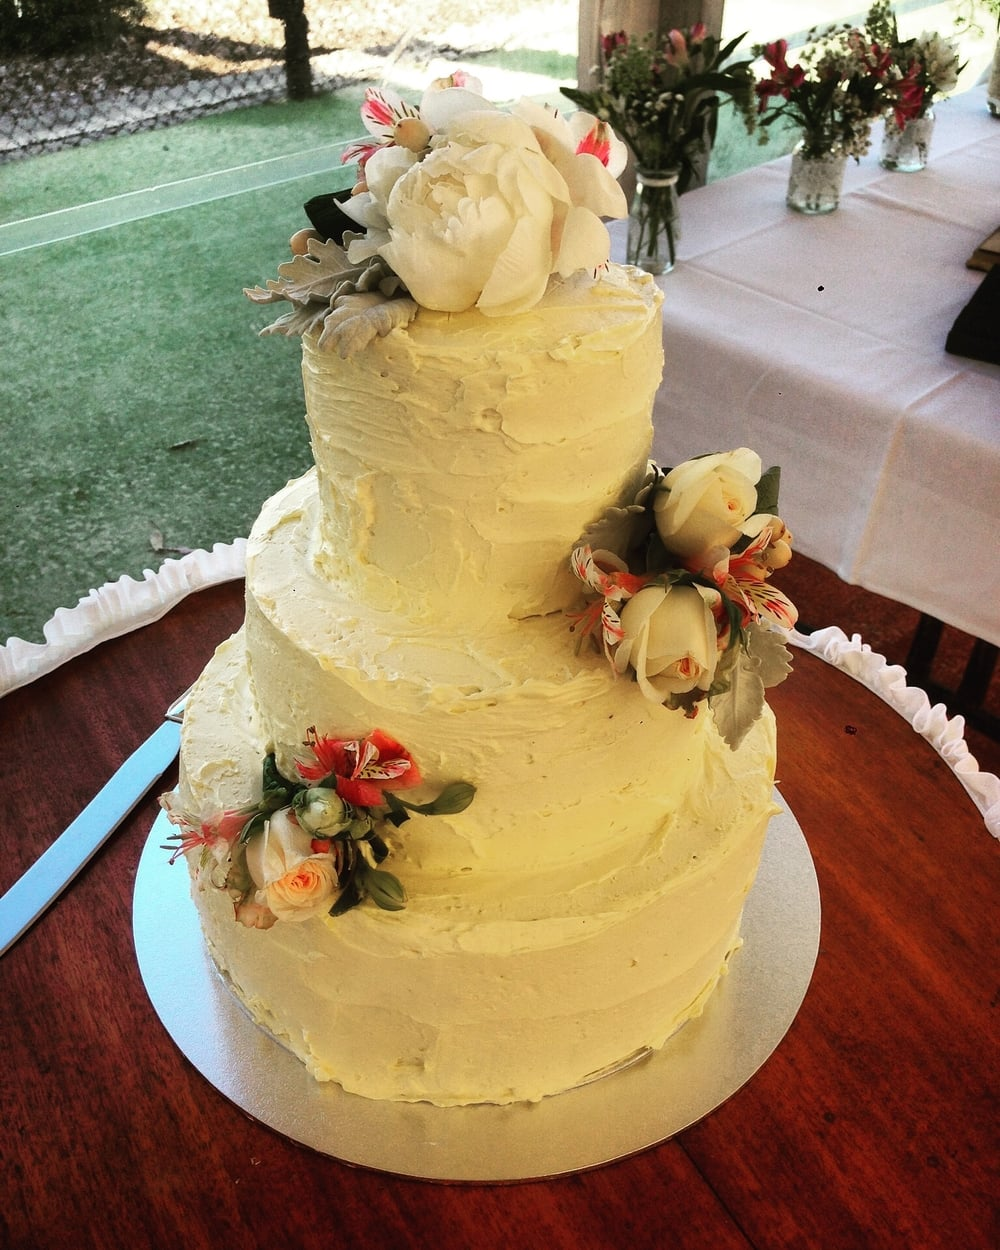 simons cake.JPG